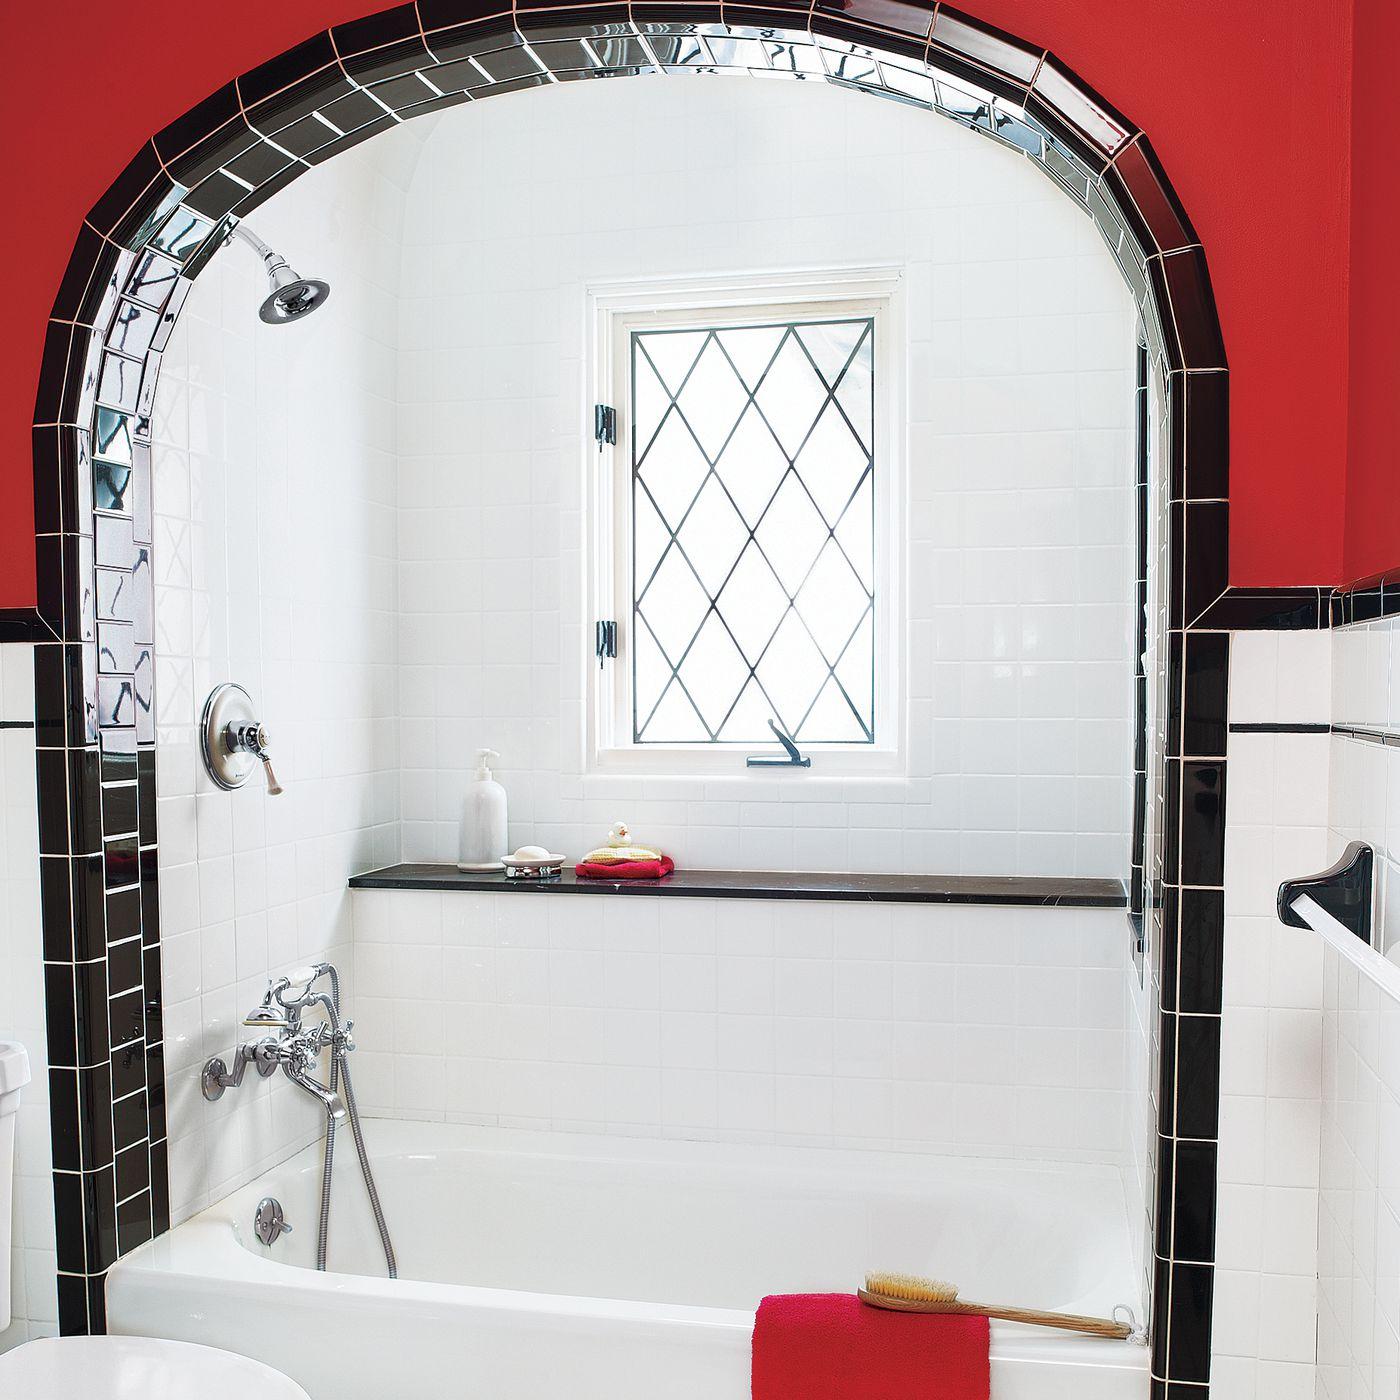 a 1930s shared bath gets a revamp